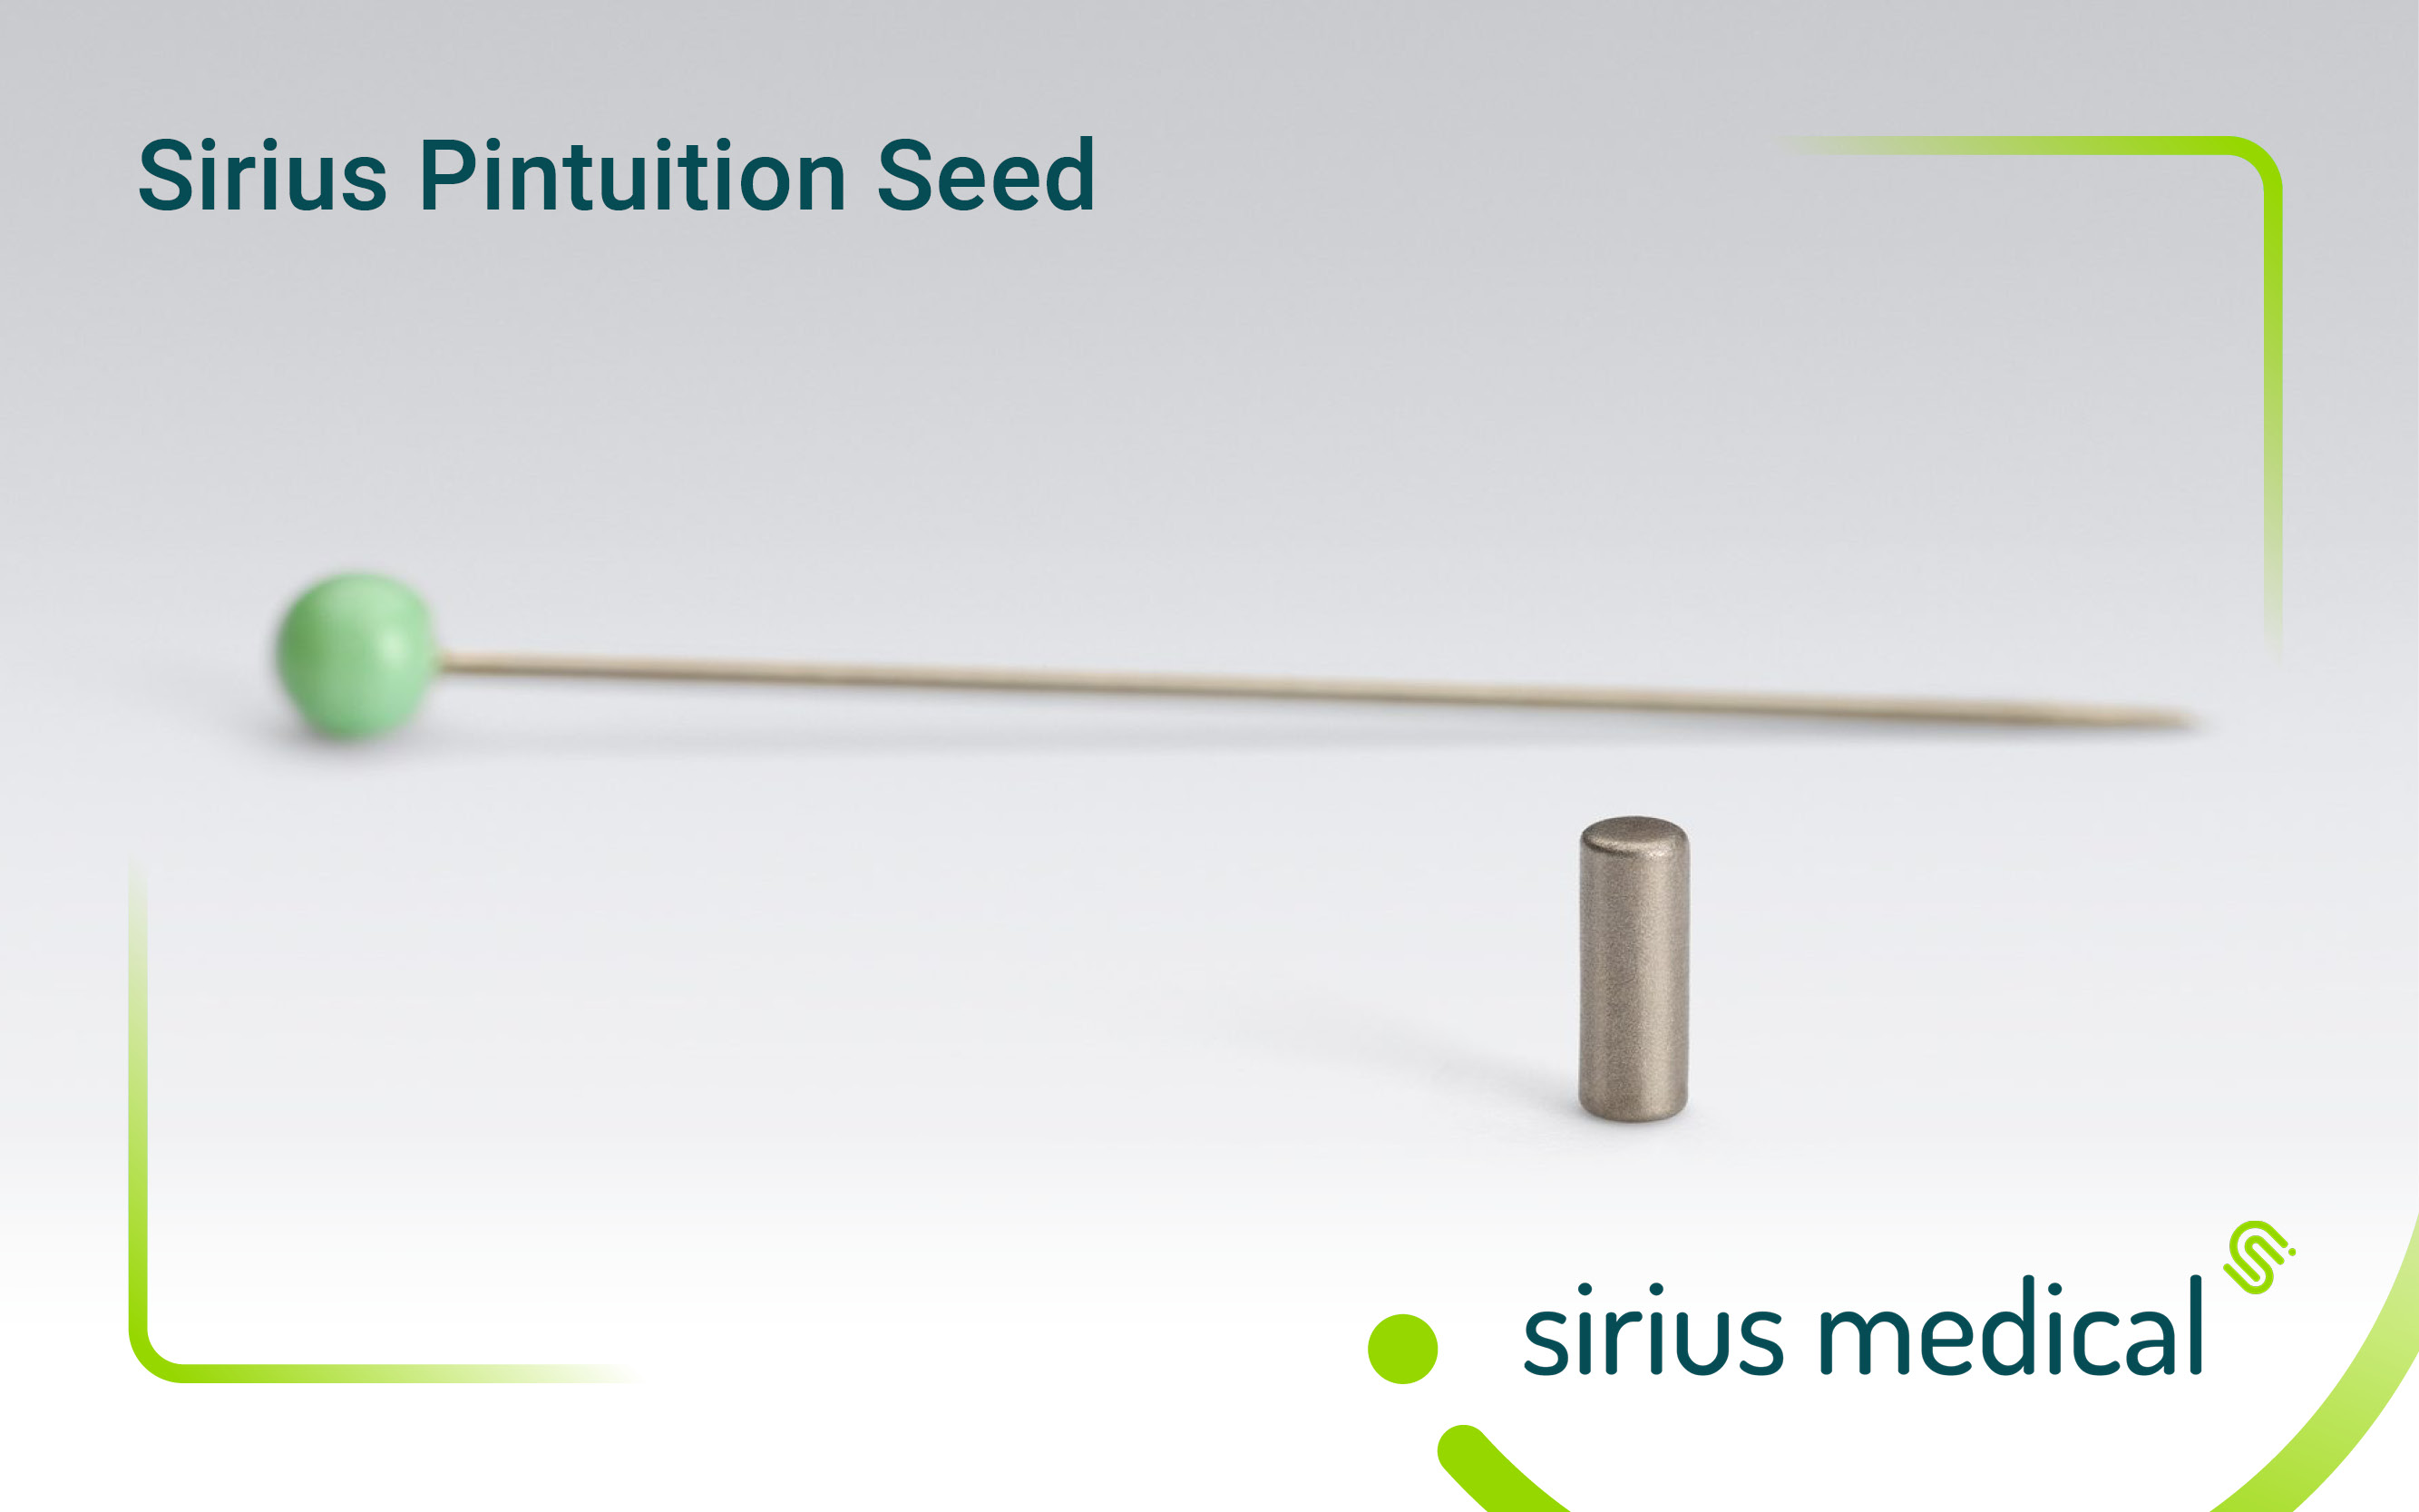 Sirius_Pintuition_Seed